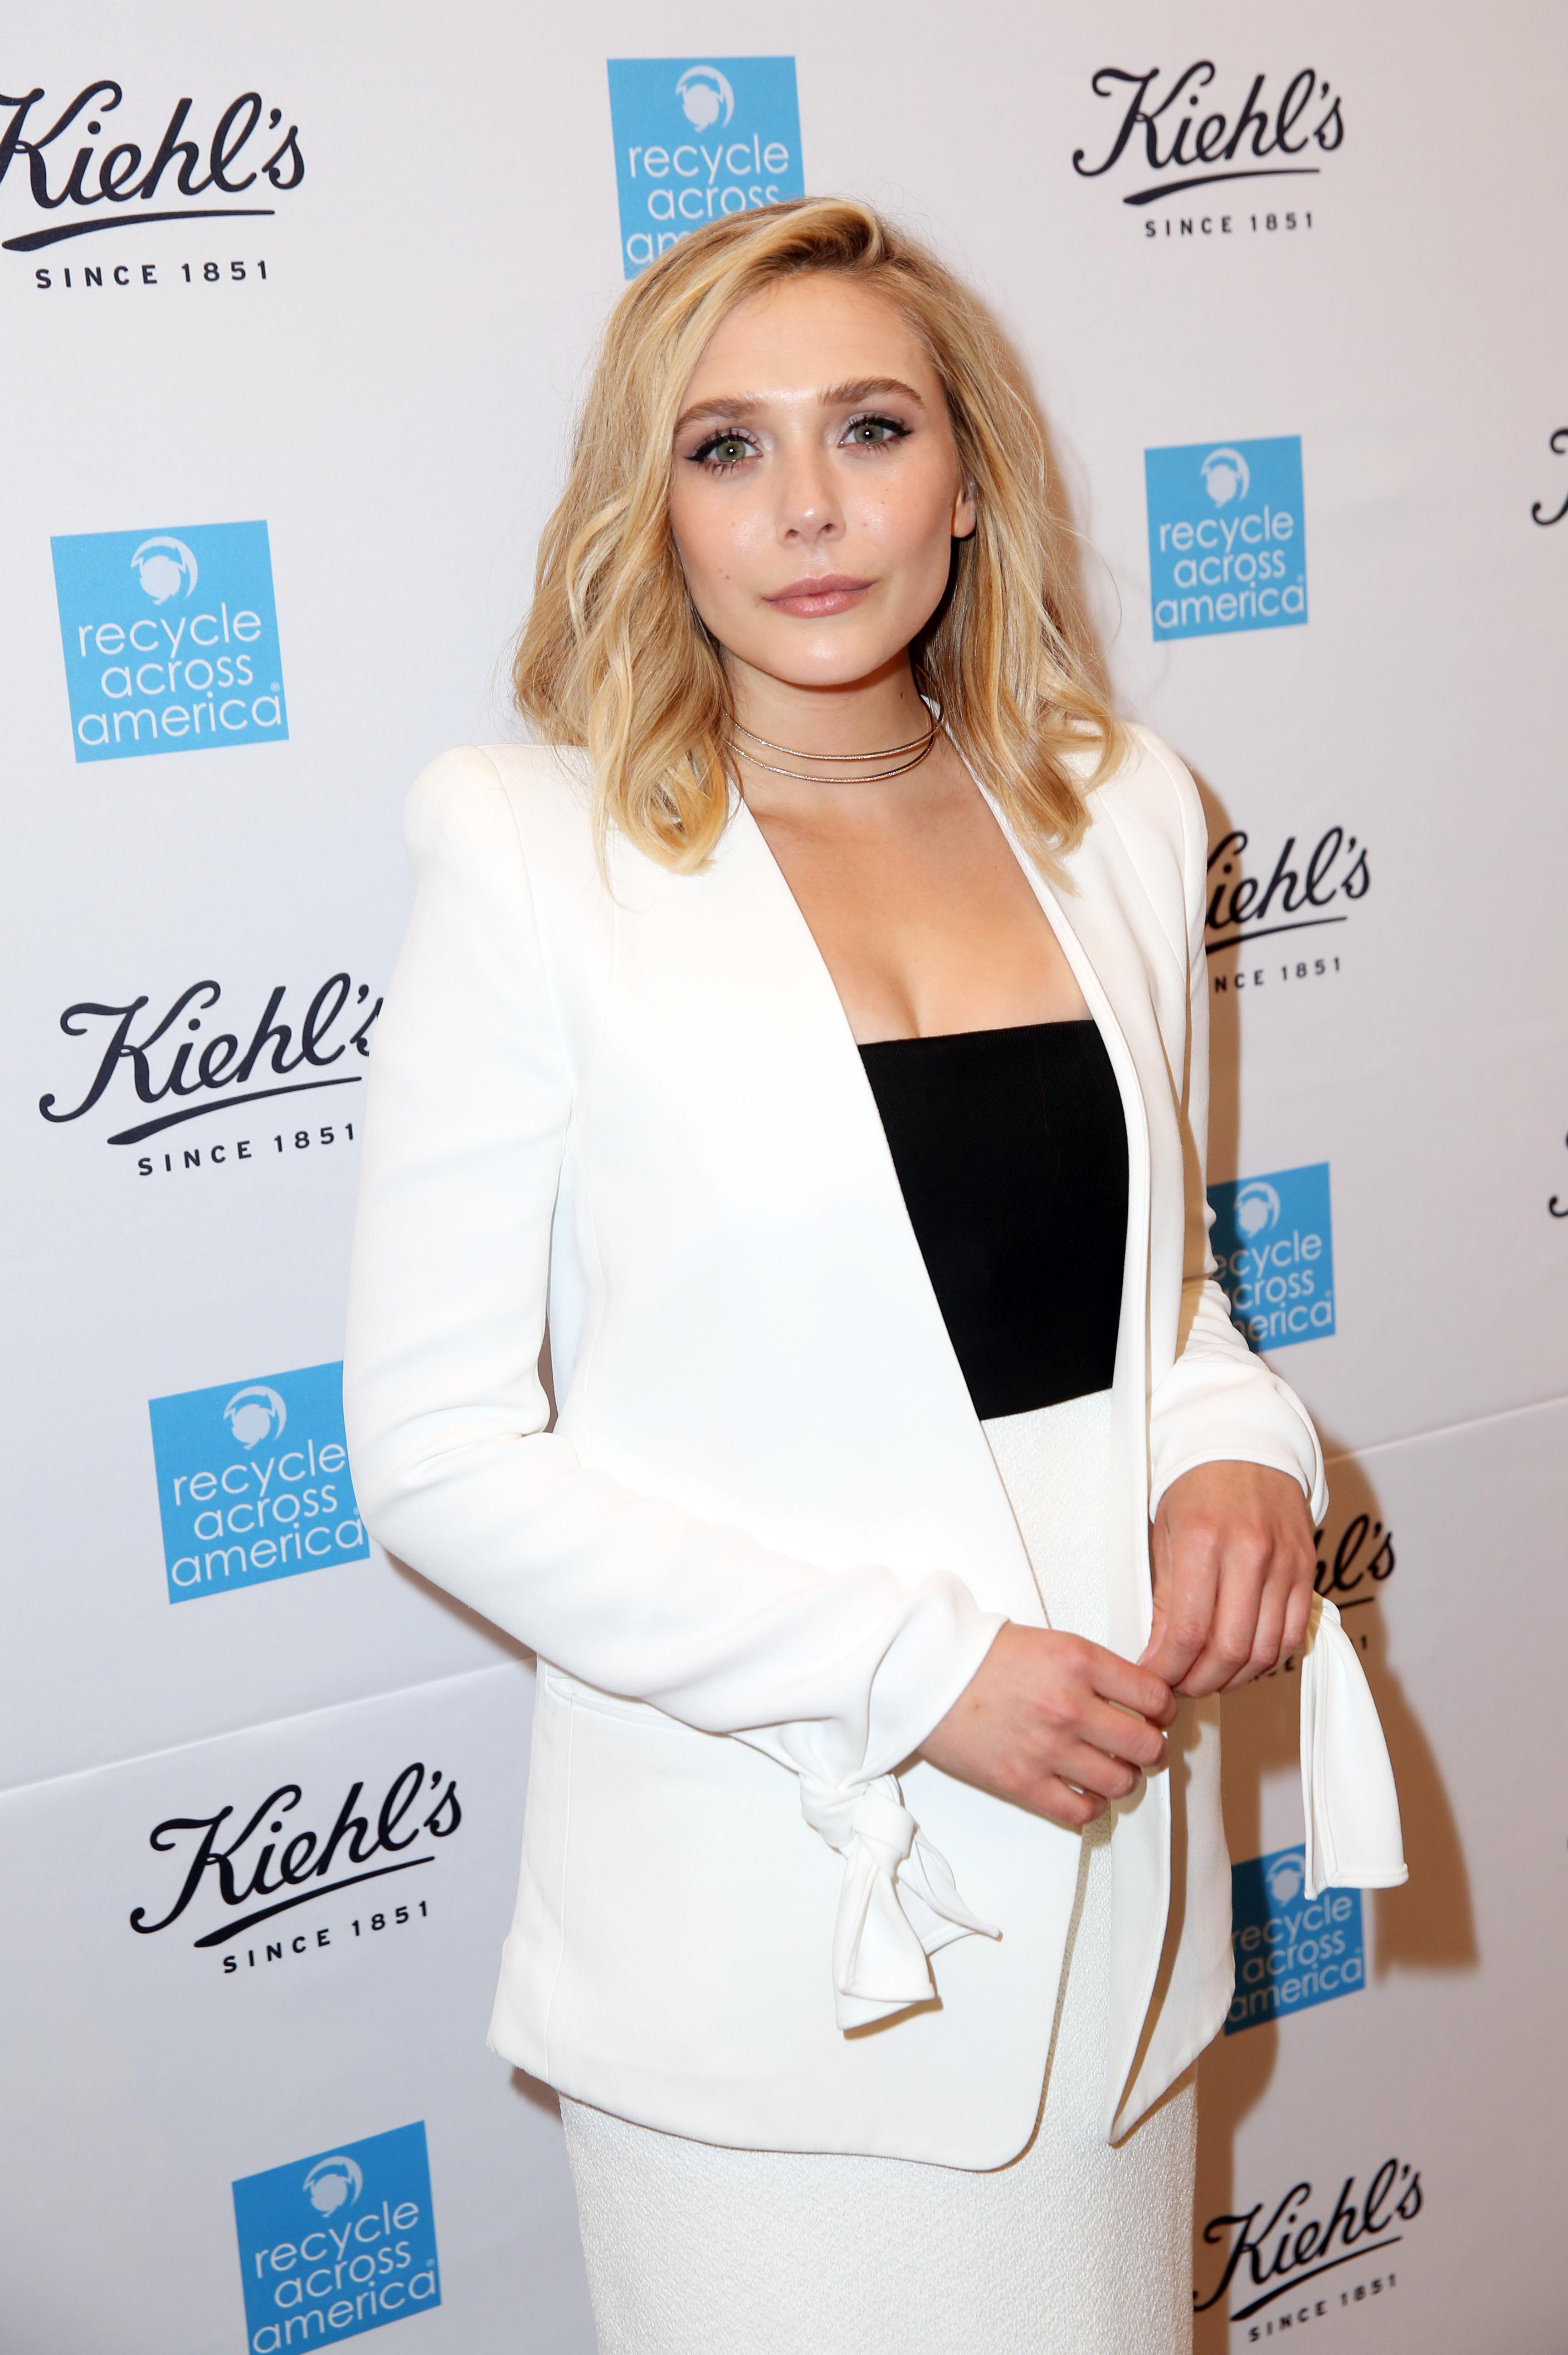 Elizabeth Olsen Kiehls - P 15